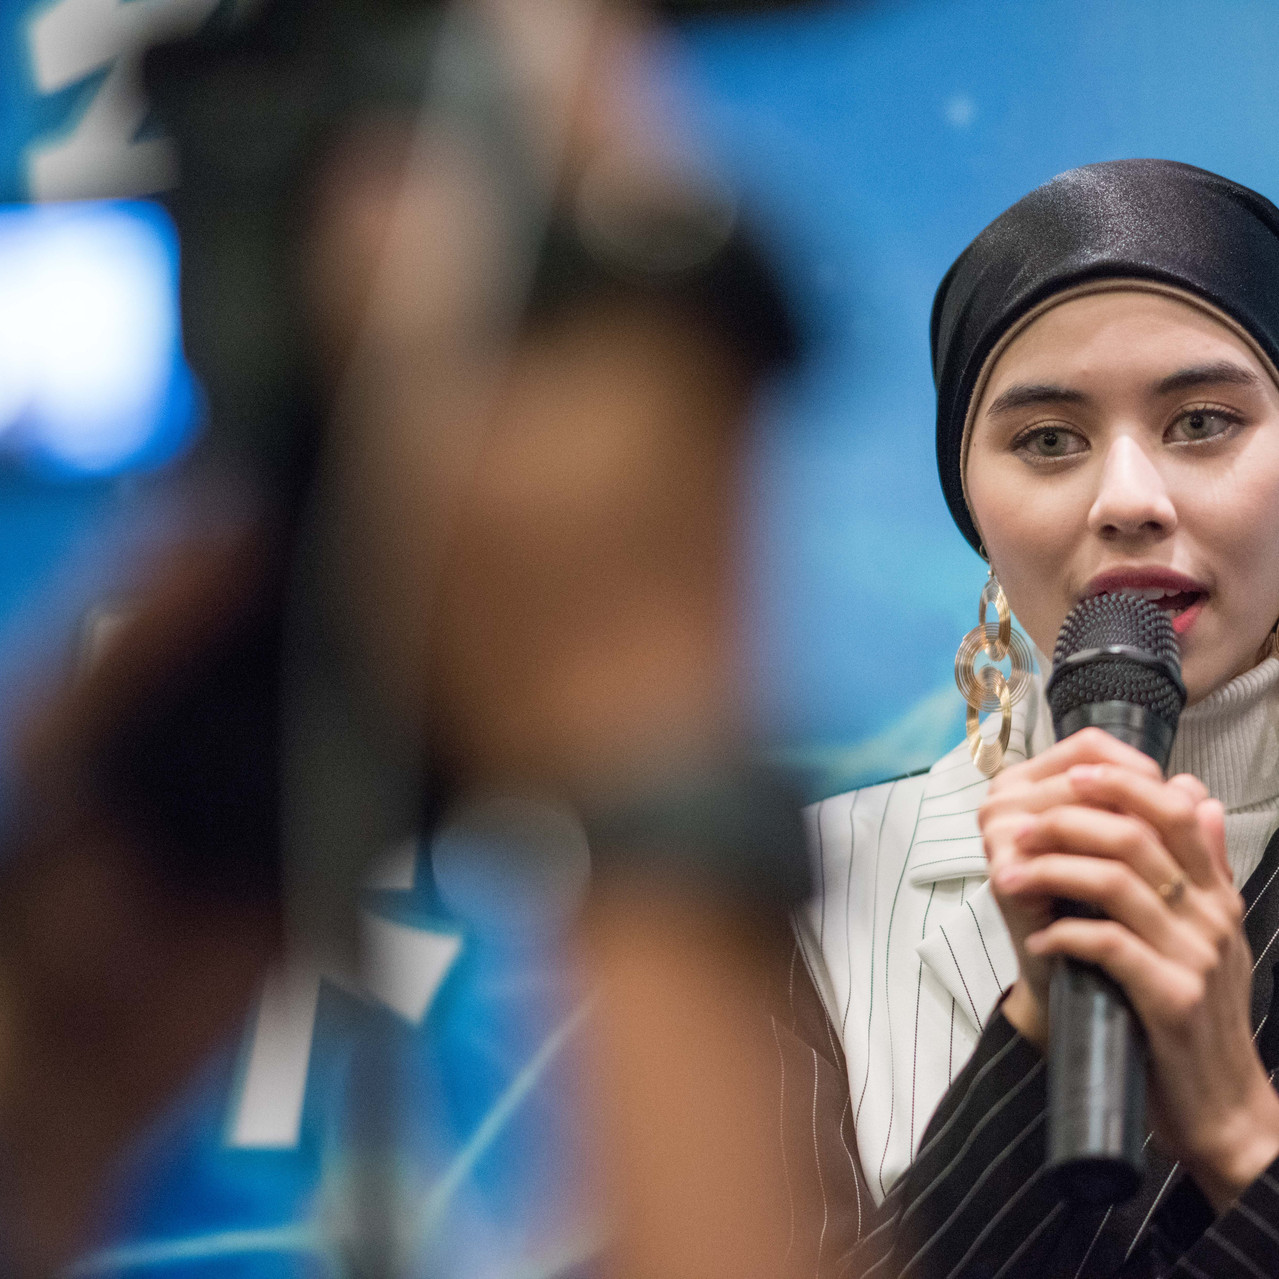 Singer Siti Nur Masyitah Mohd Yusoff, be